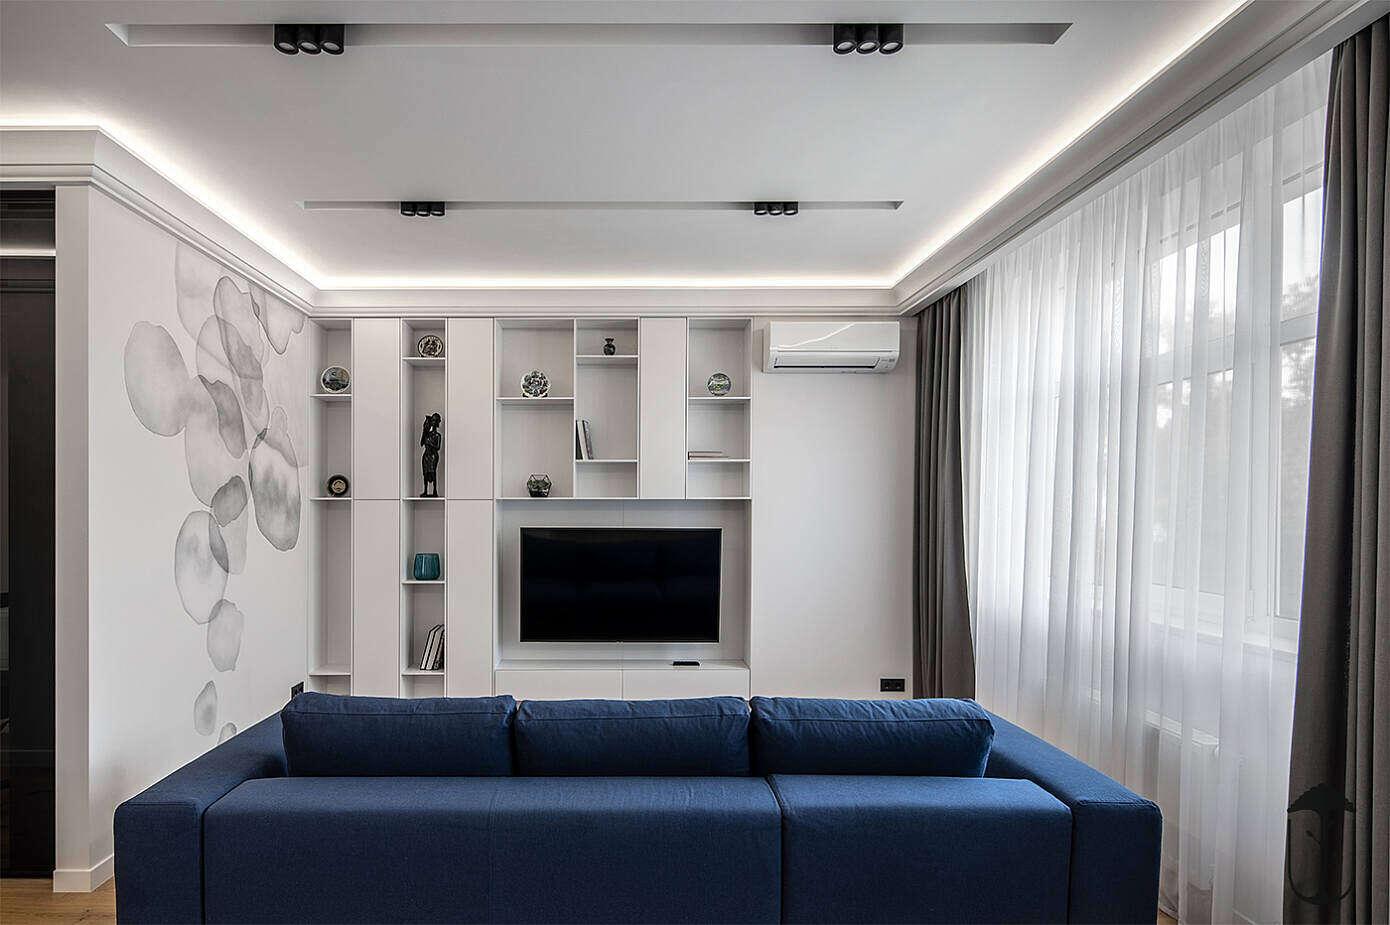 Apartment in Kiev by Dinara Yusupova